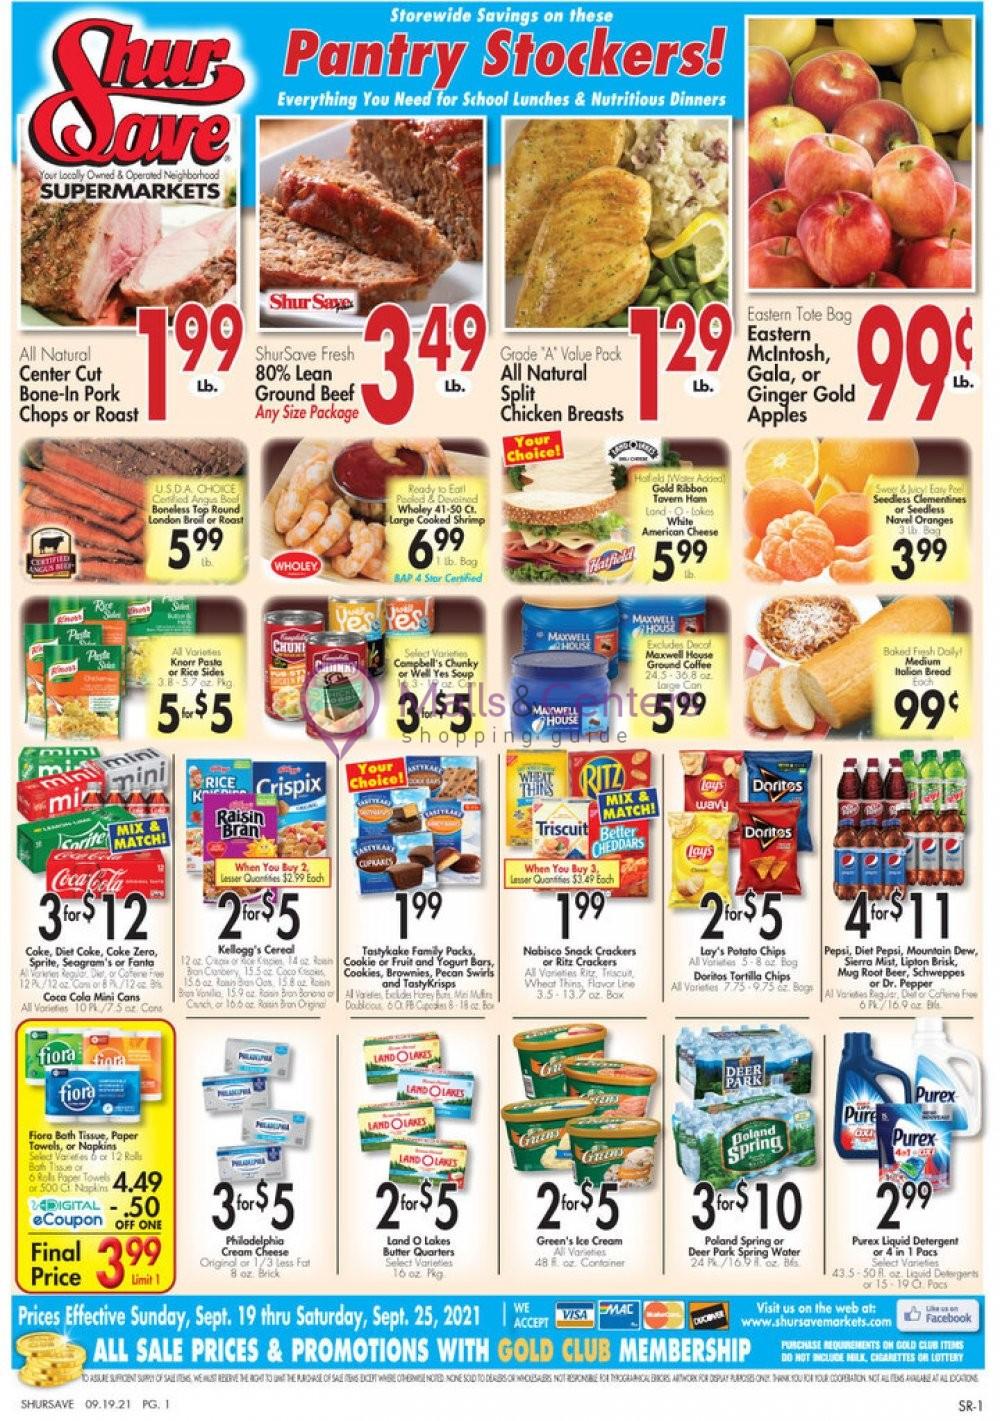 weekly ads ShurSave Markets - page 1 - mallscenters.com